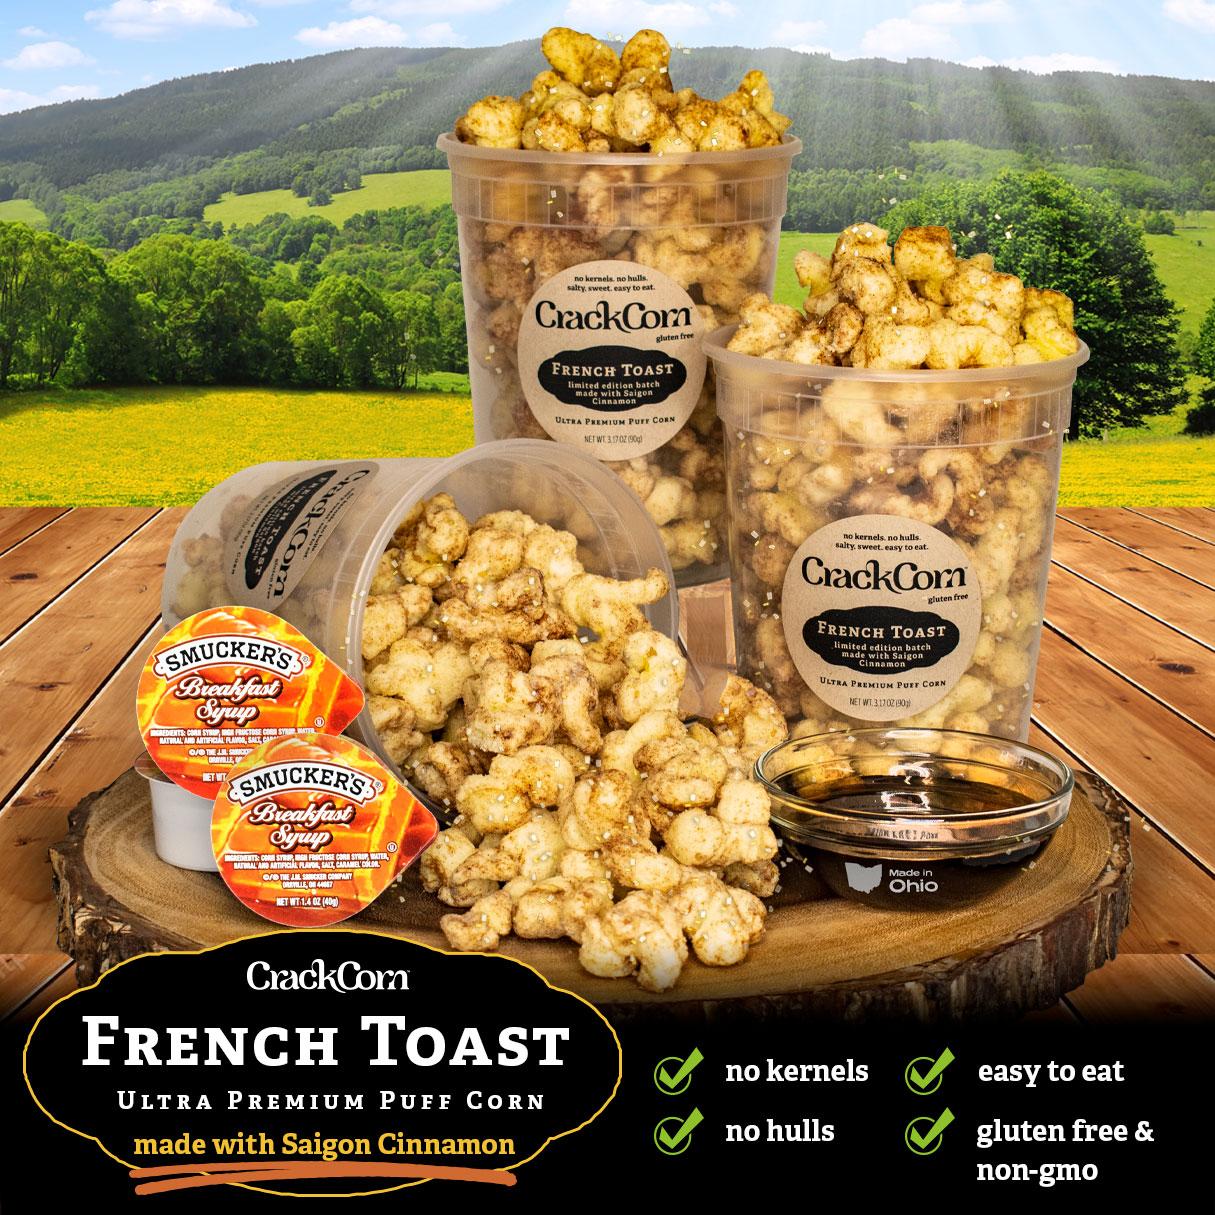 French Toast - Ultra-Premium Puff Corn